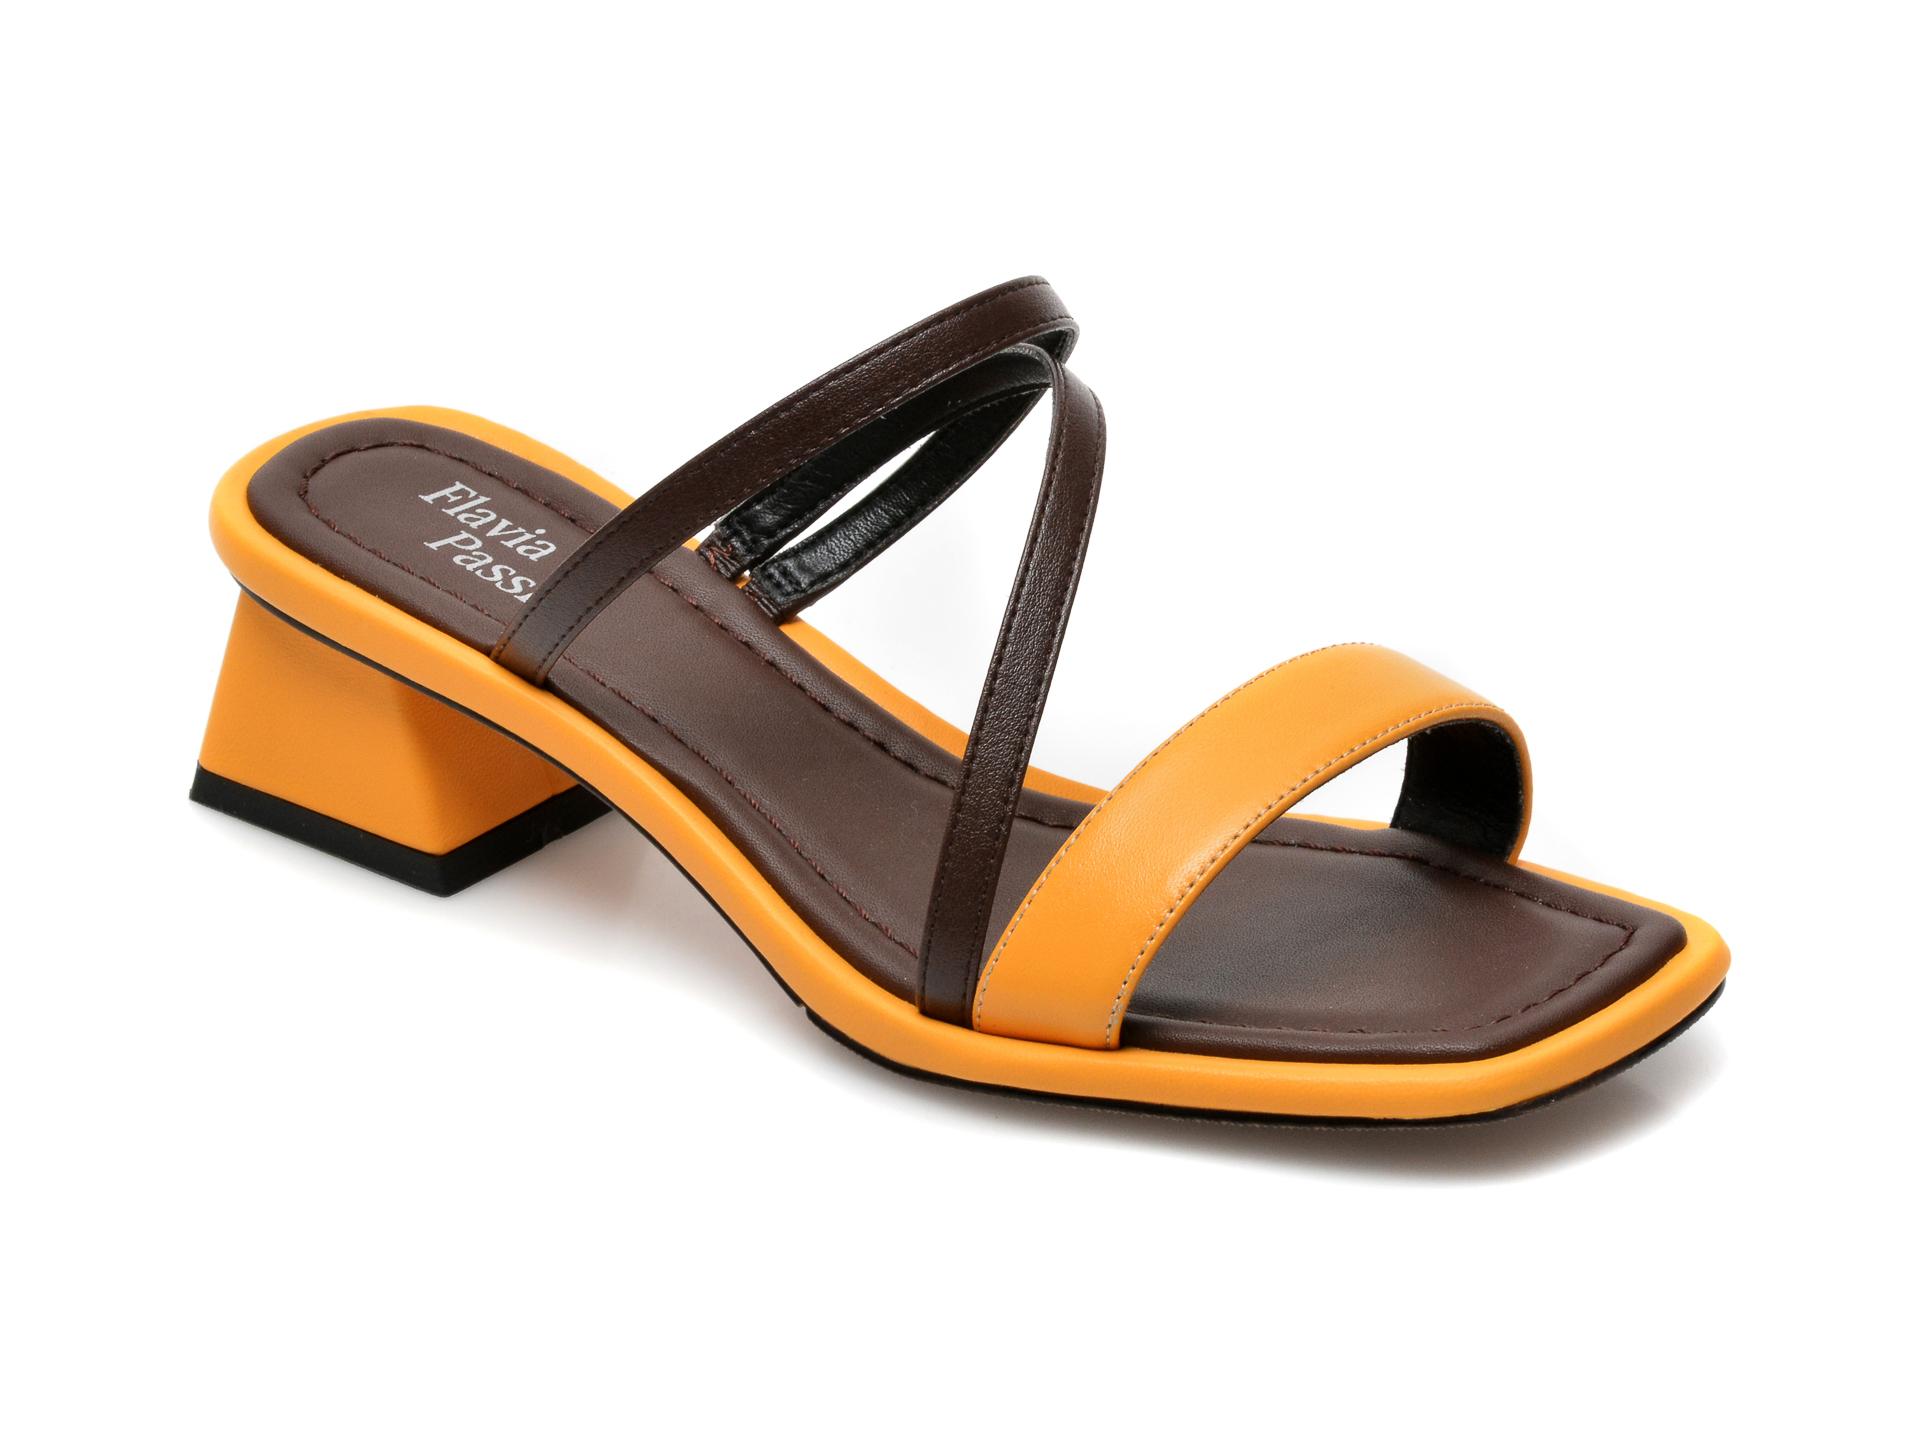 Papuci FLAVIA PASSINI galbeni, 1211317, din piele ecologica imagine otter.ro 2021